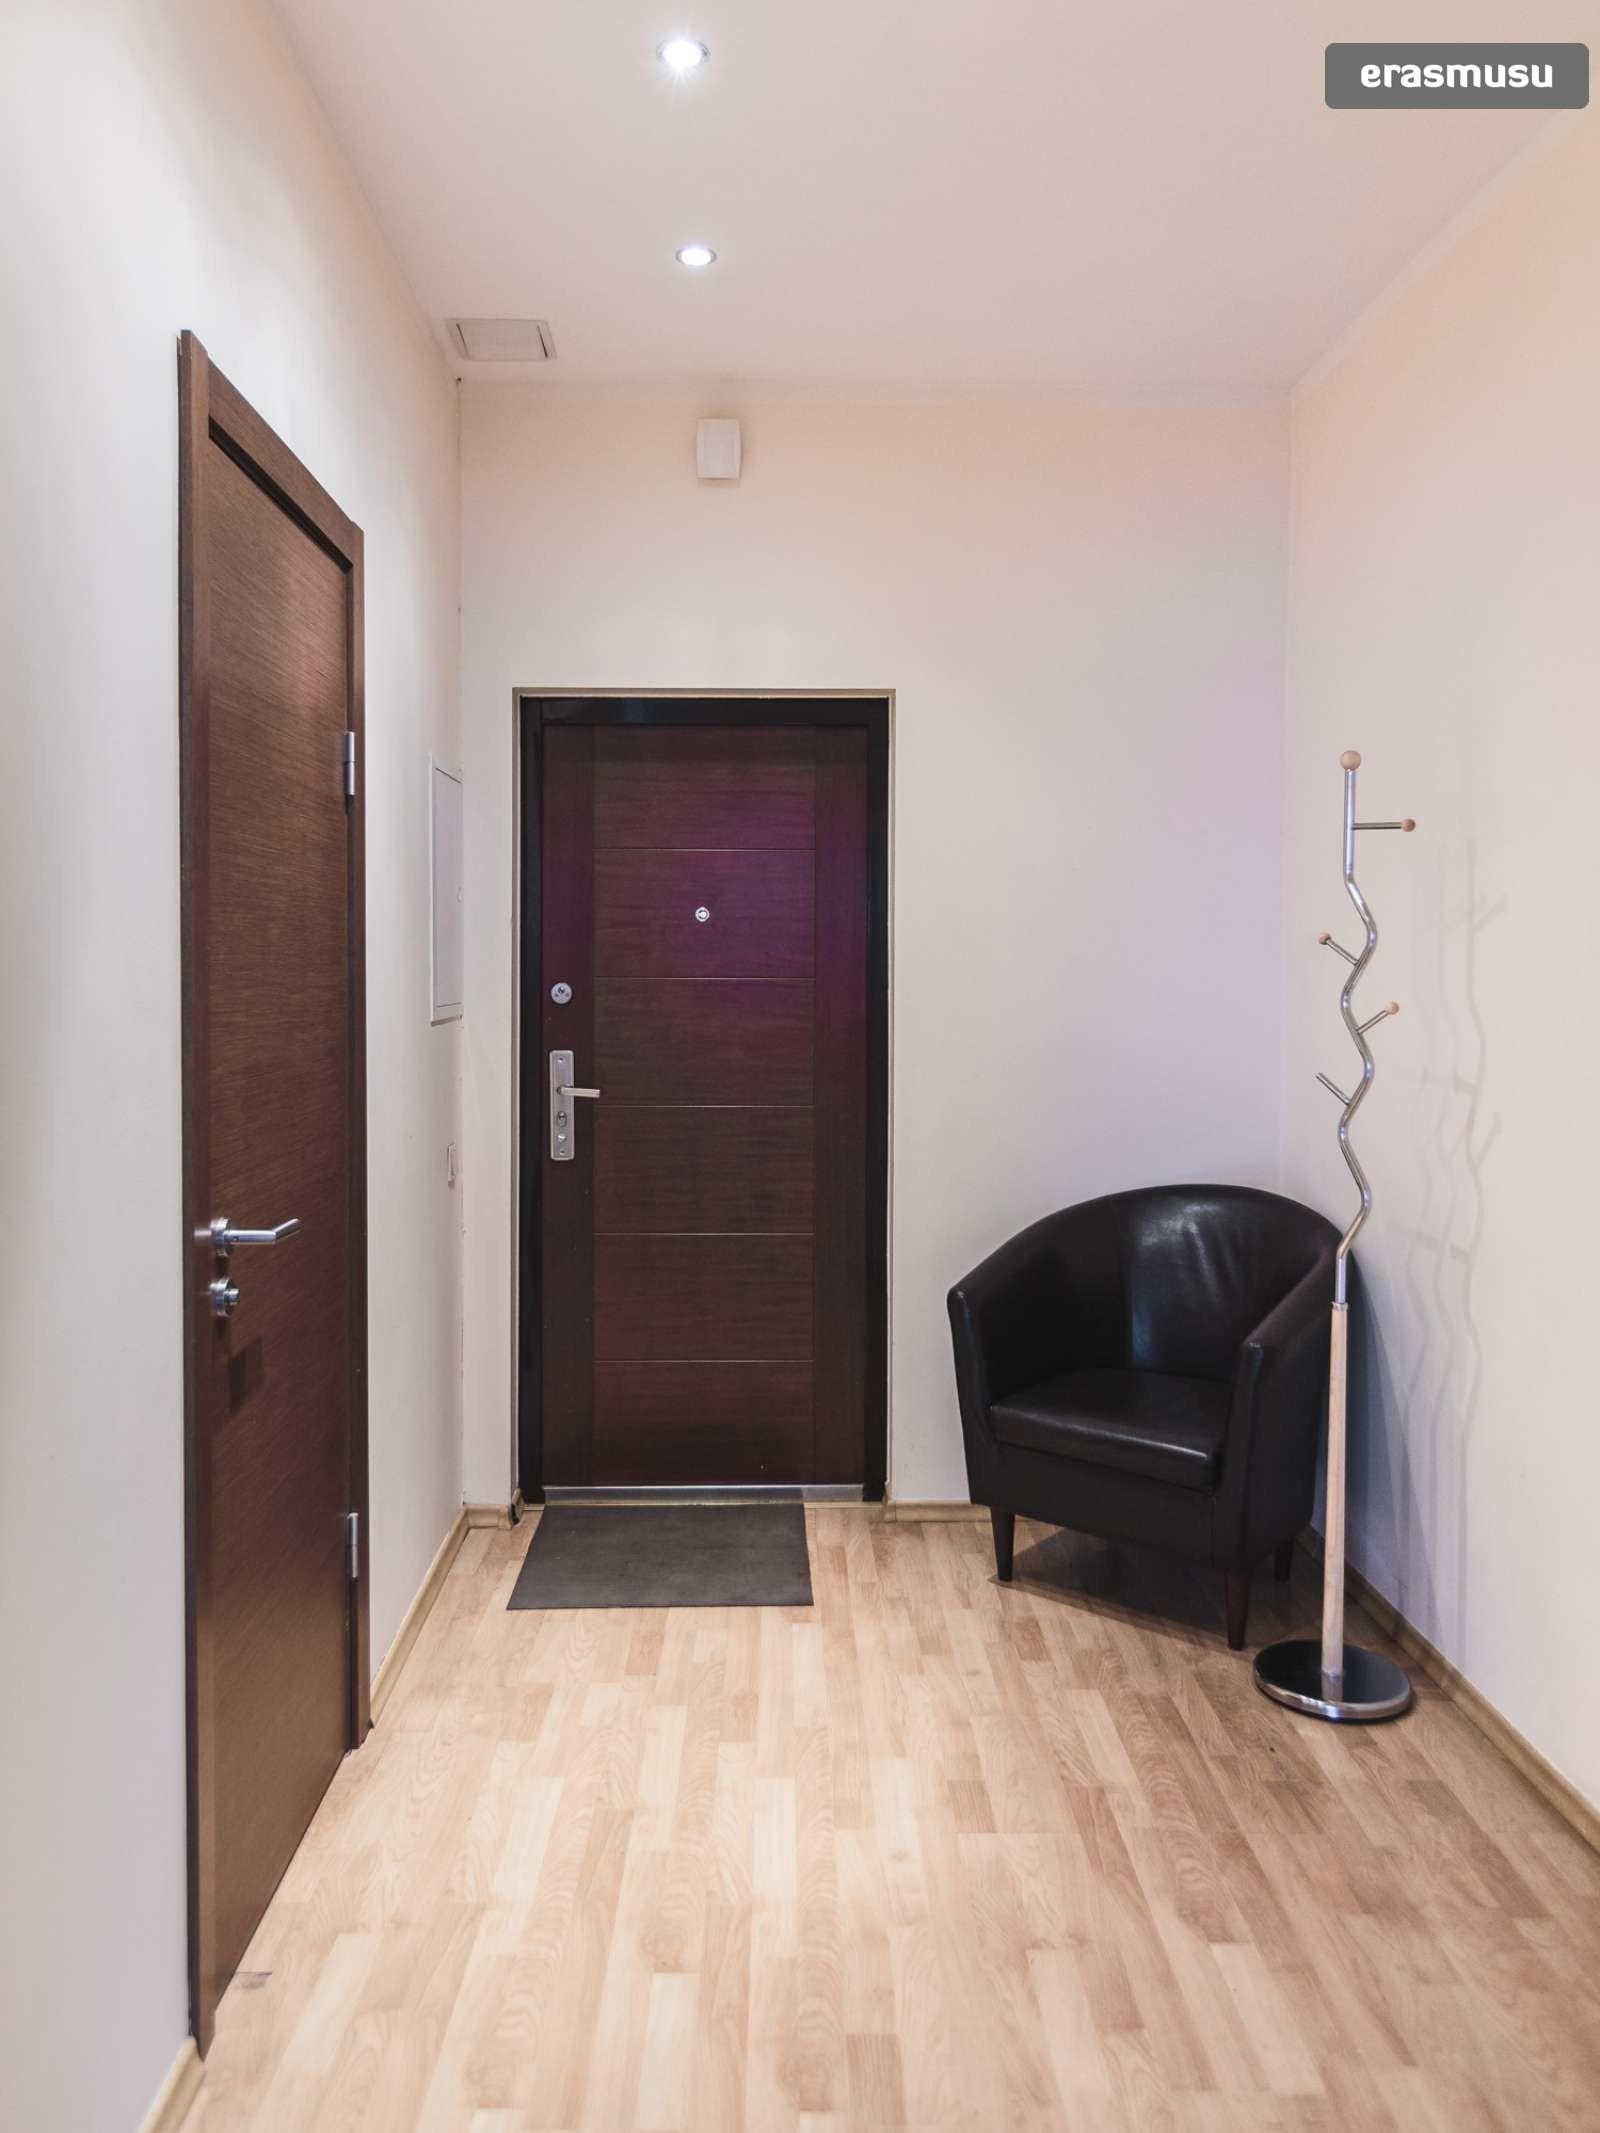 1-bedroom-apartment-rent-maskavas-forstate-dd50d6bb00d6fa8b0f259